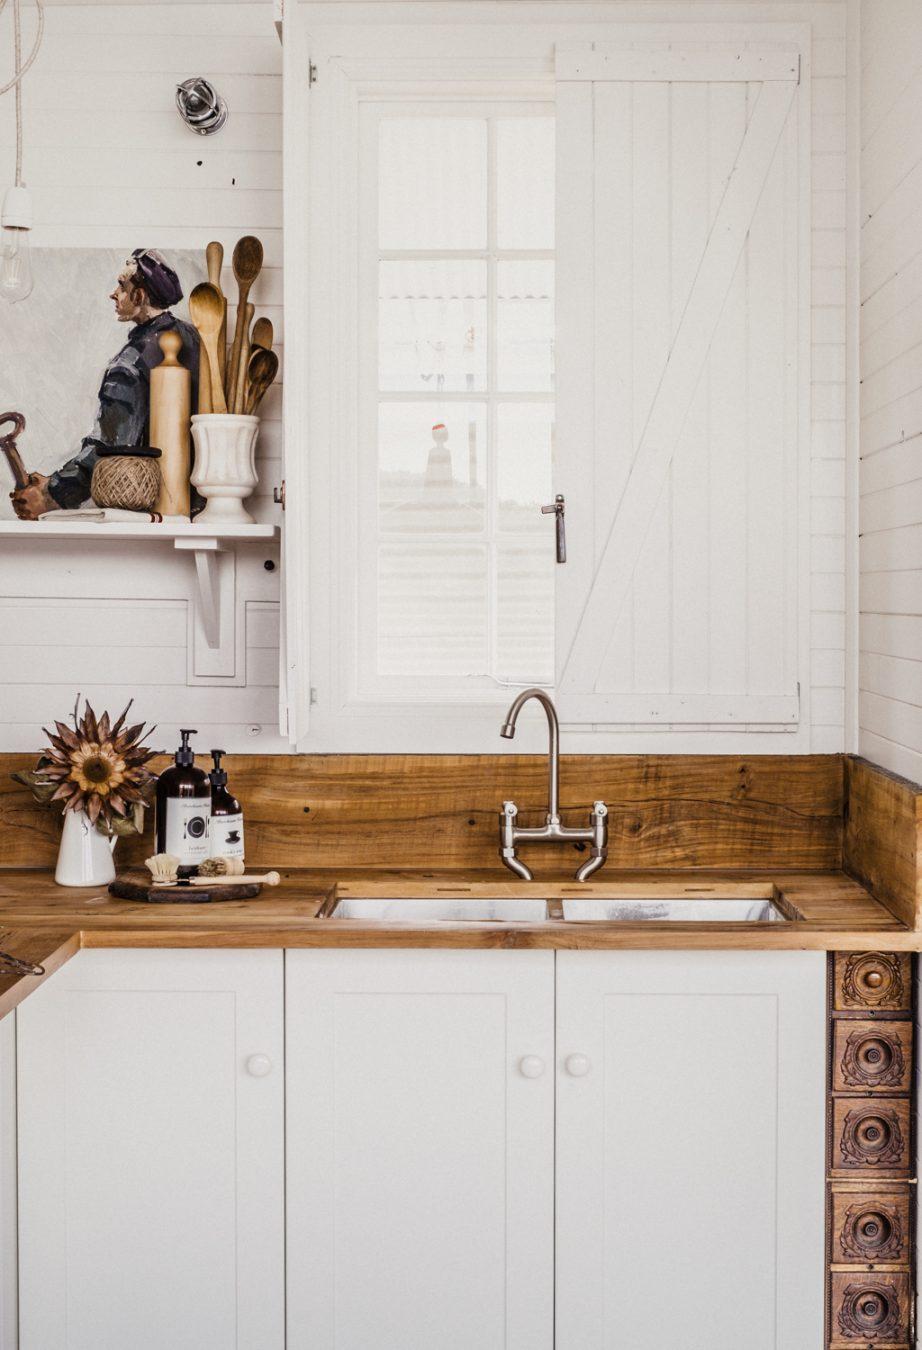 Rustic kitchen in Captains Rest - Tasmania